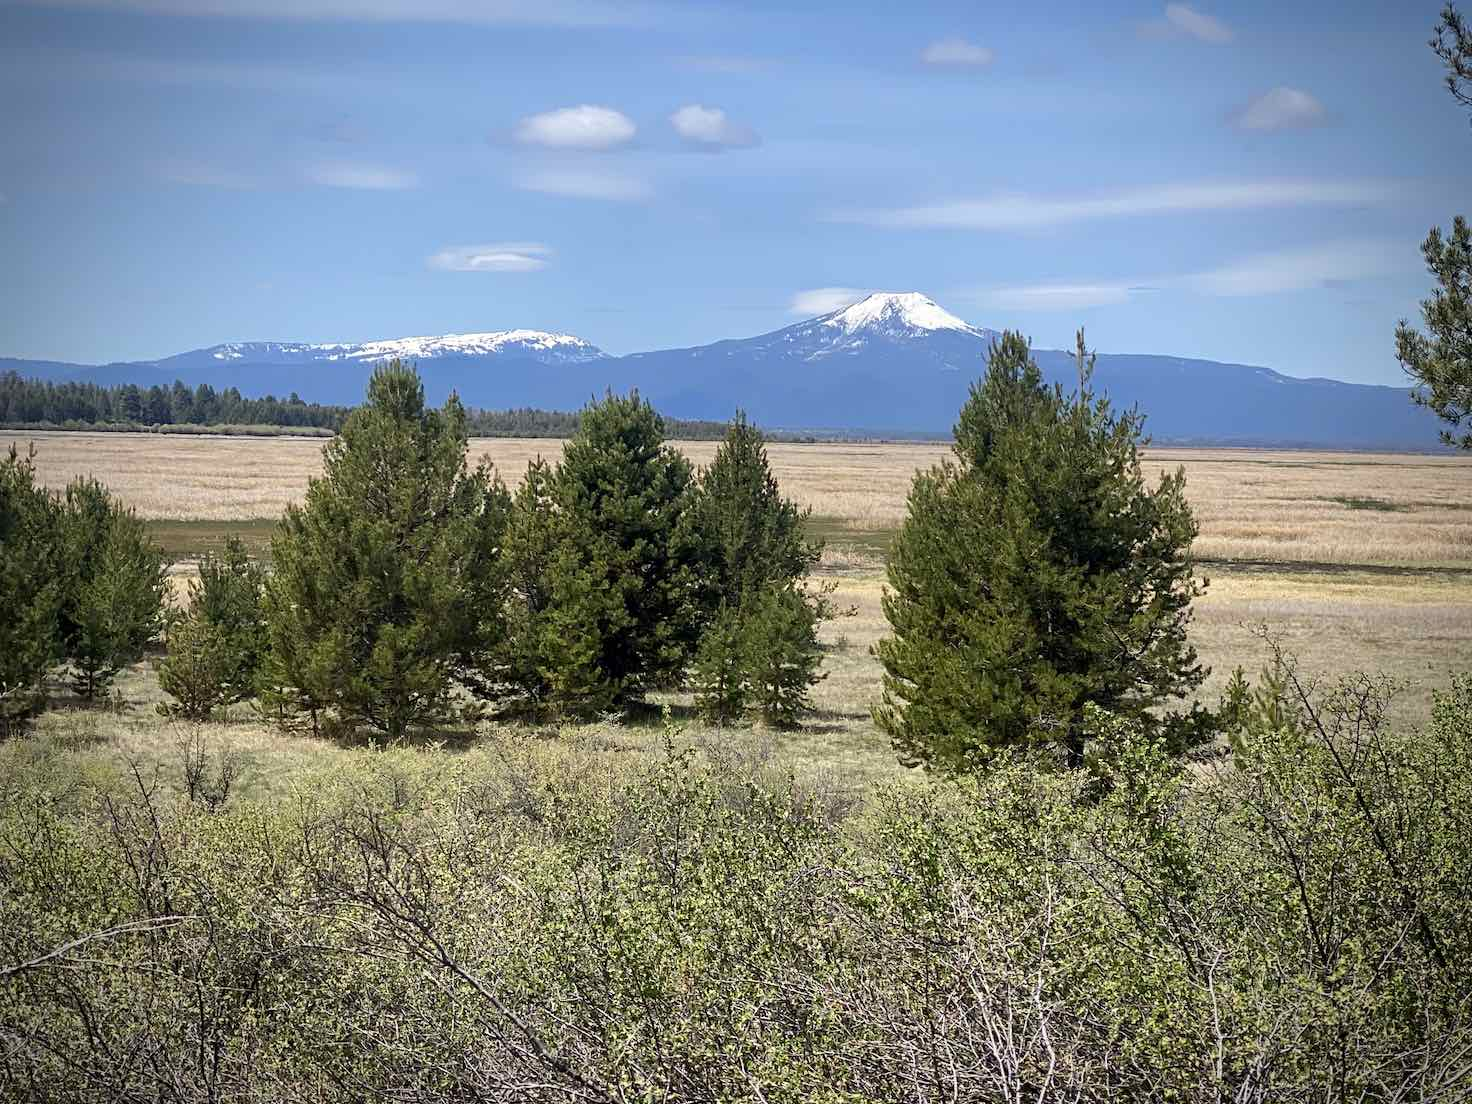 View of Mt Scott across marsh and grassy plains.